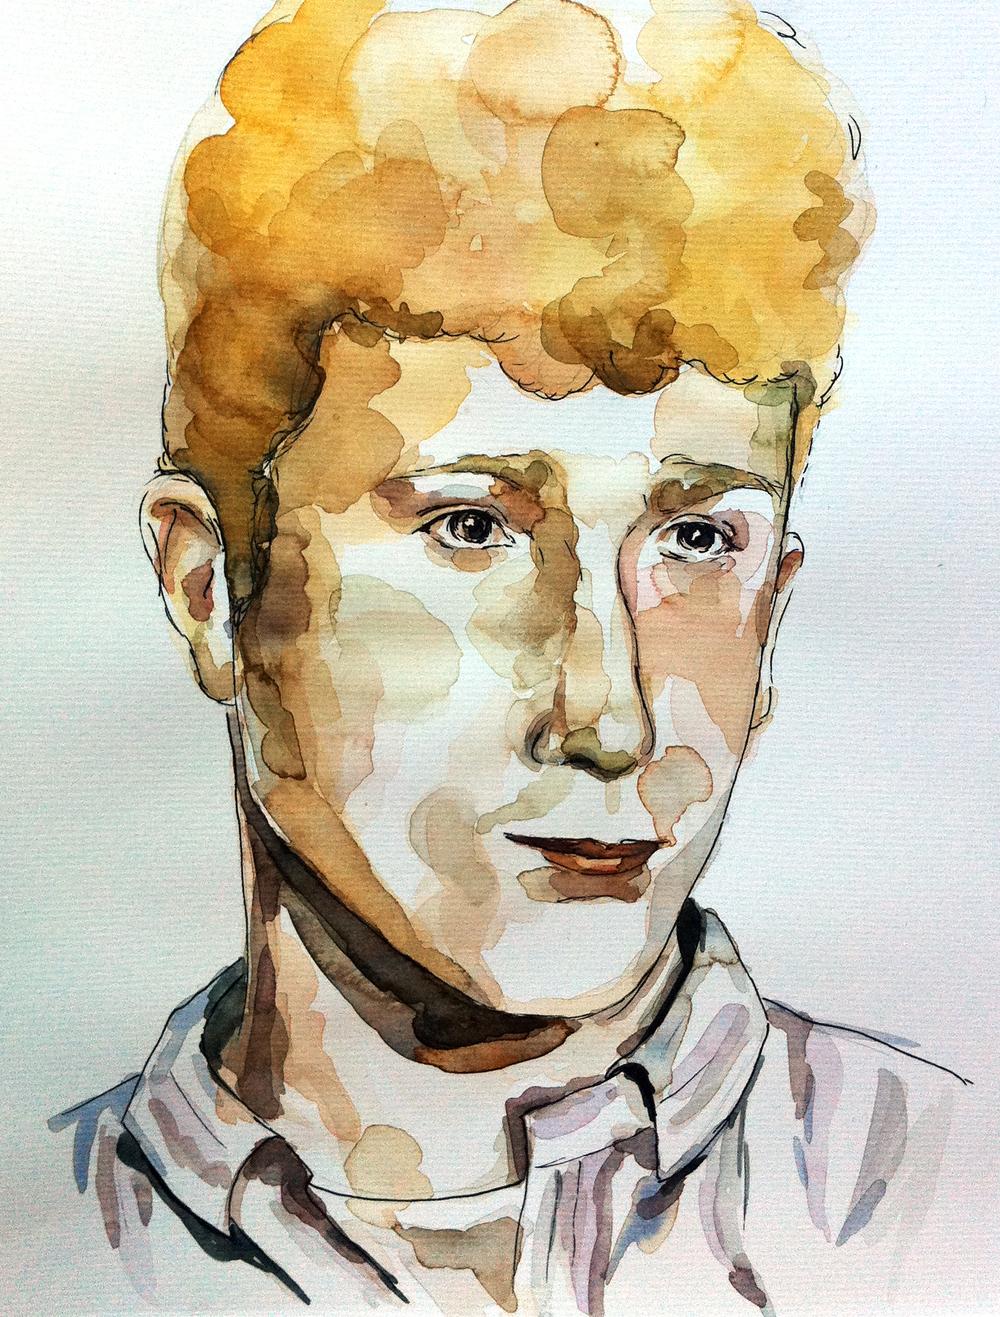 Shane McKay